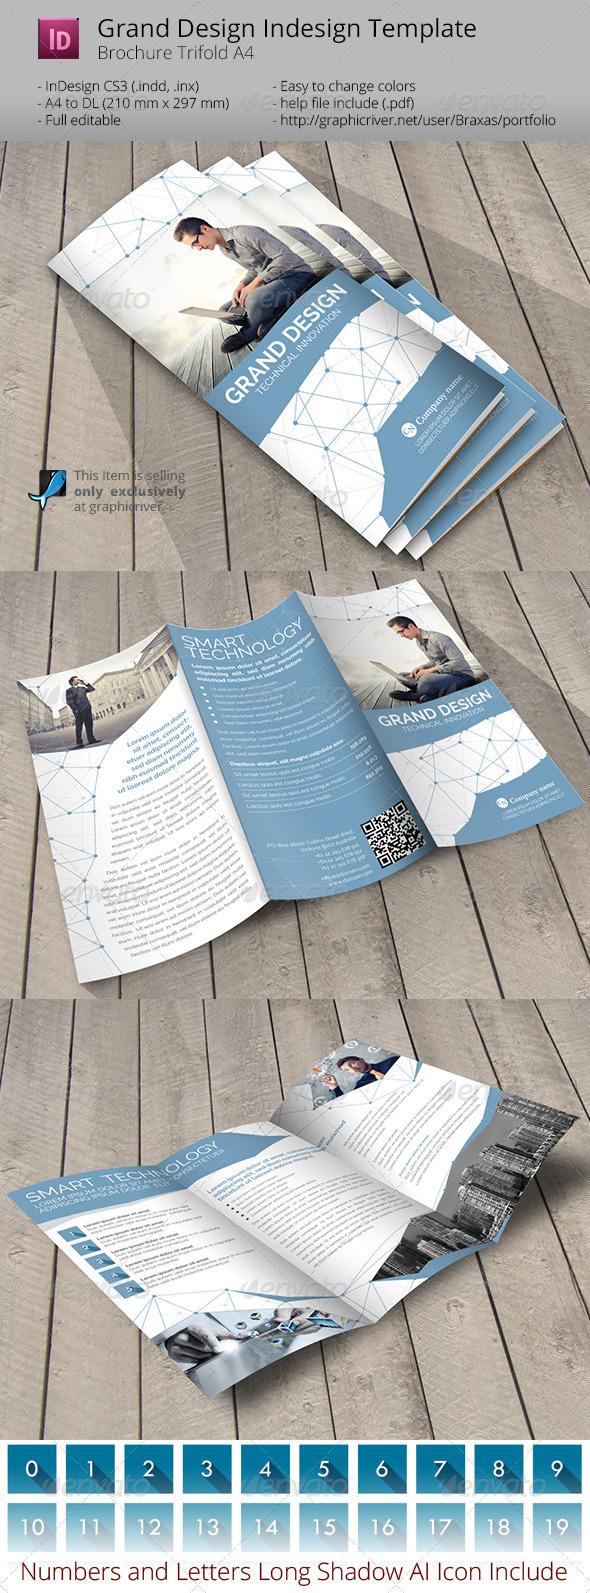 GraphicRiver Grand Design Trifold Indesign Template 6768838